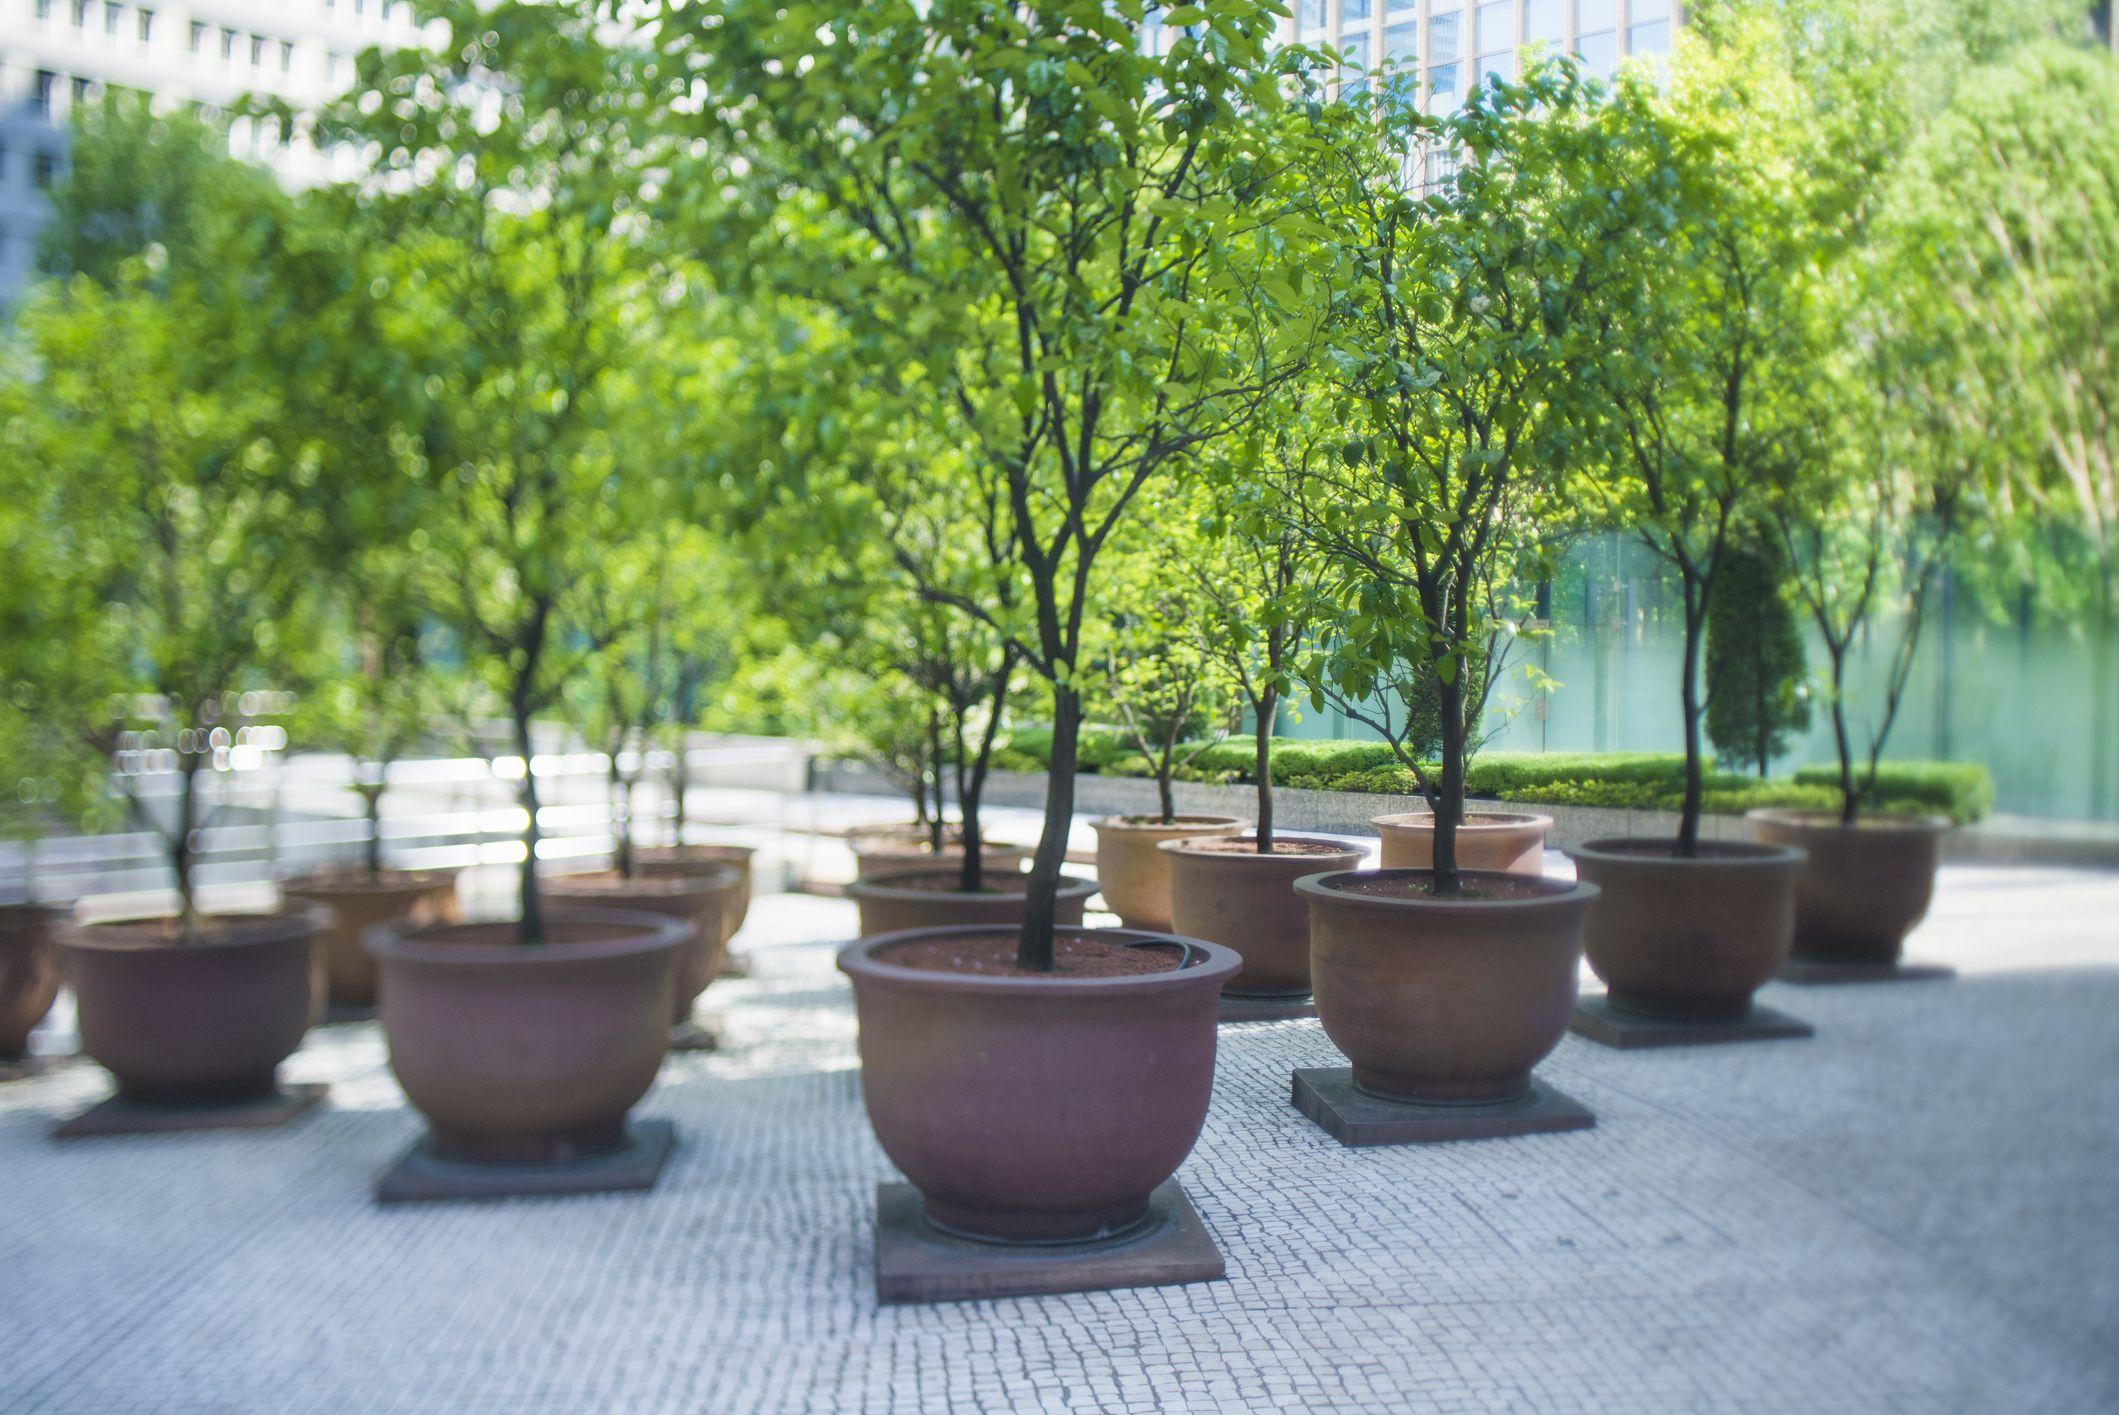 Mature Bamboo Plants